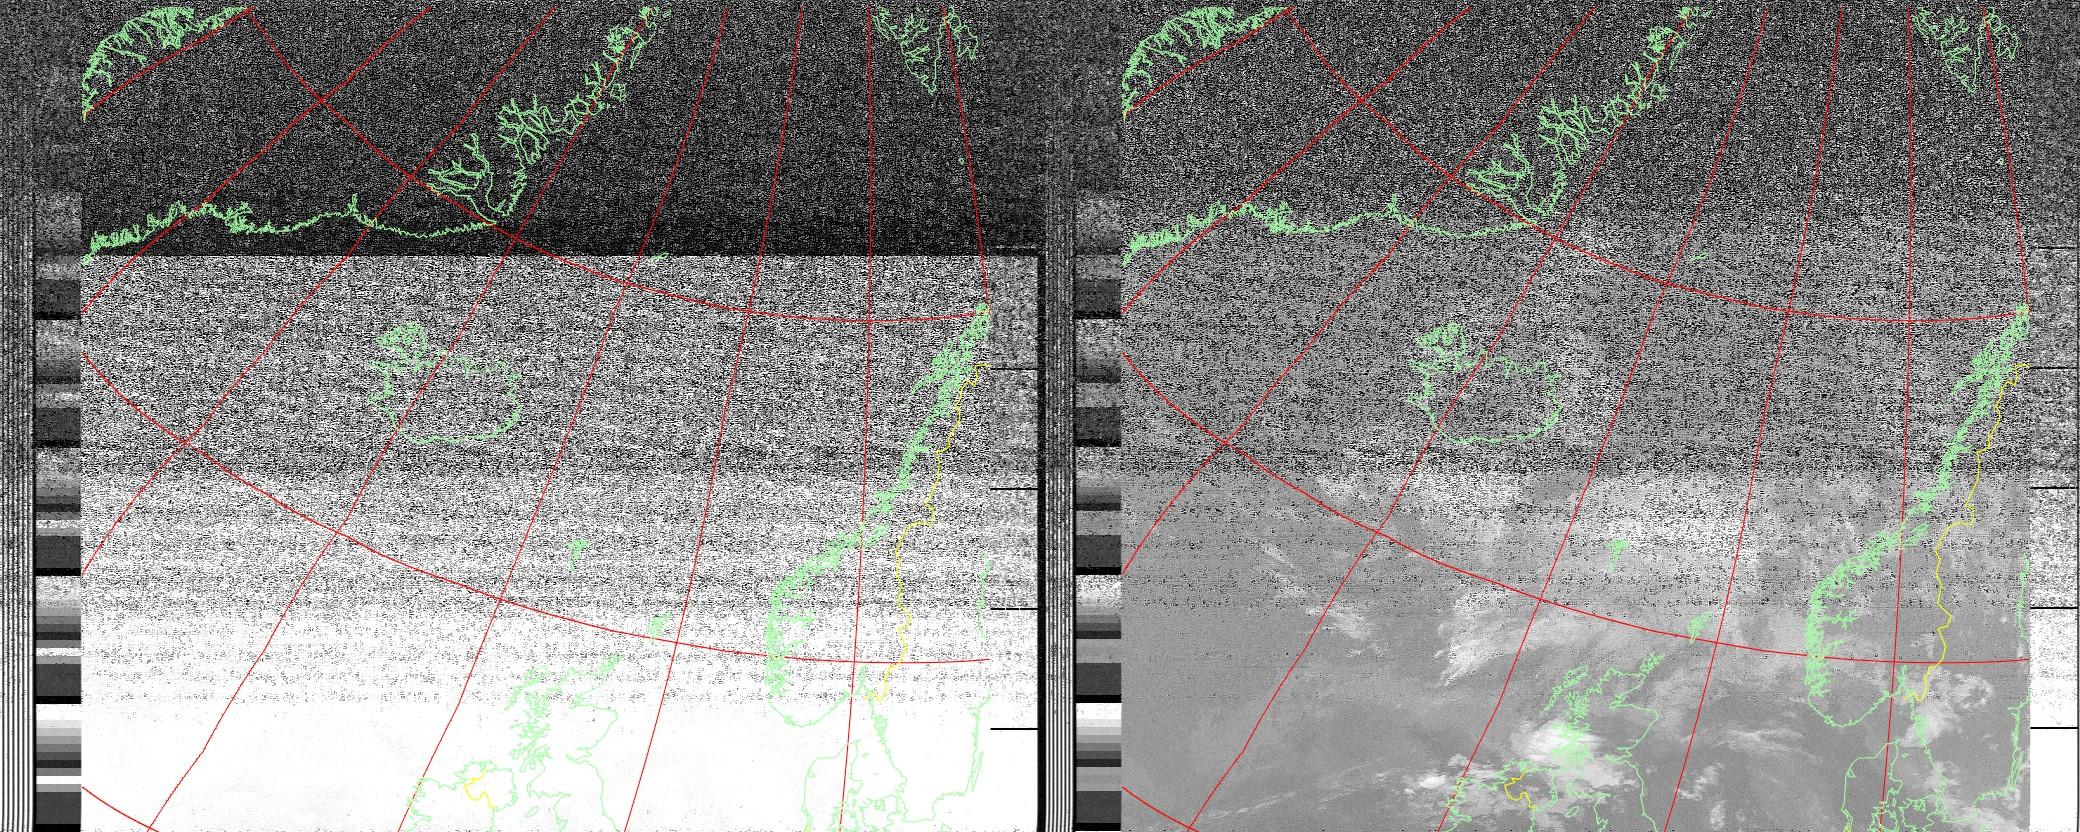 NOAA18_5_10_137.916_21:43